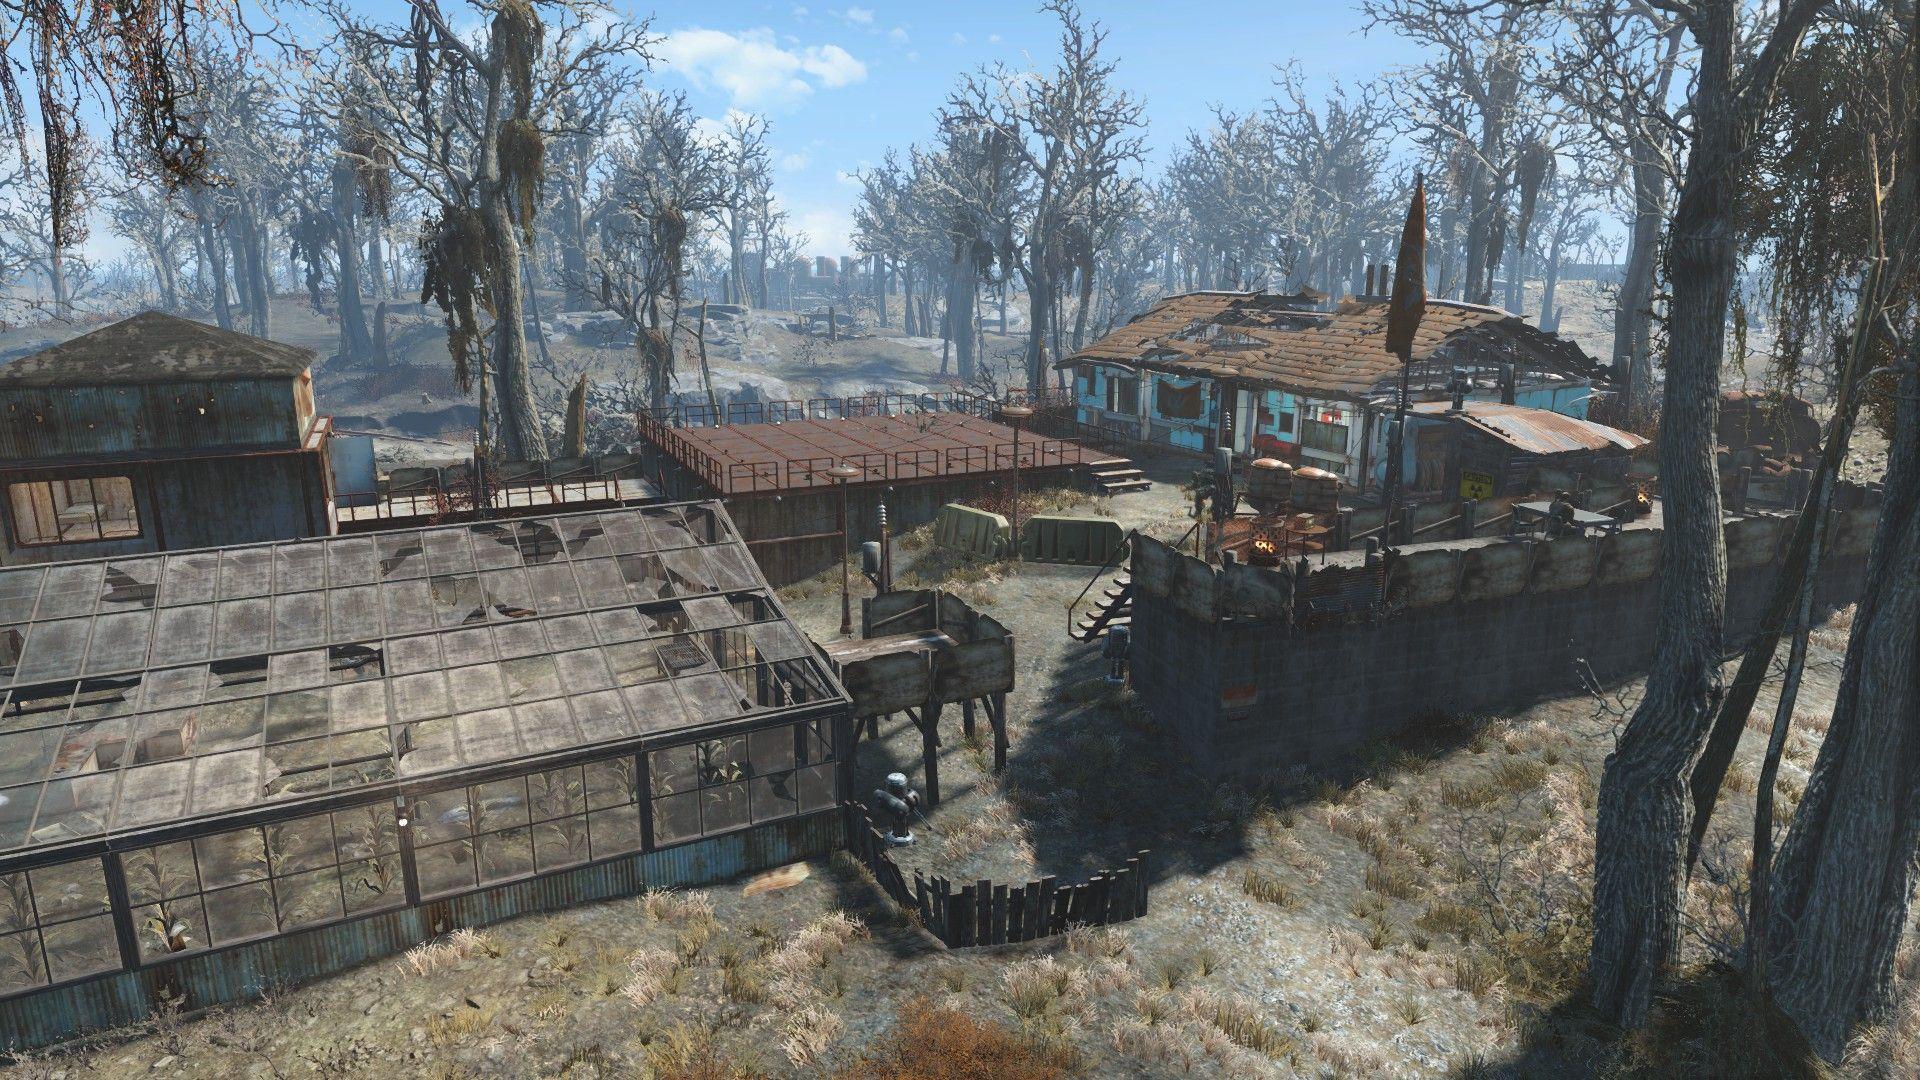 Greentop Nursery Brotherhood of Steel Outpost - No Mods #Fallout4